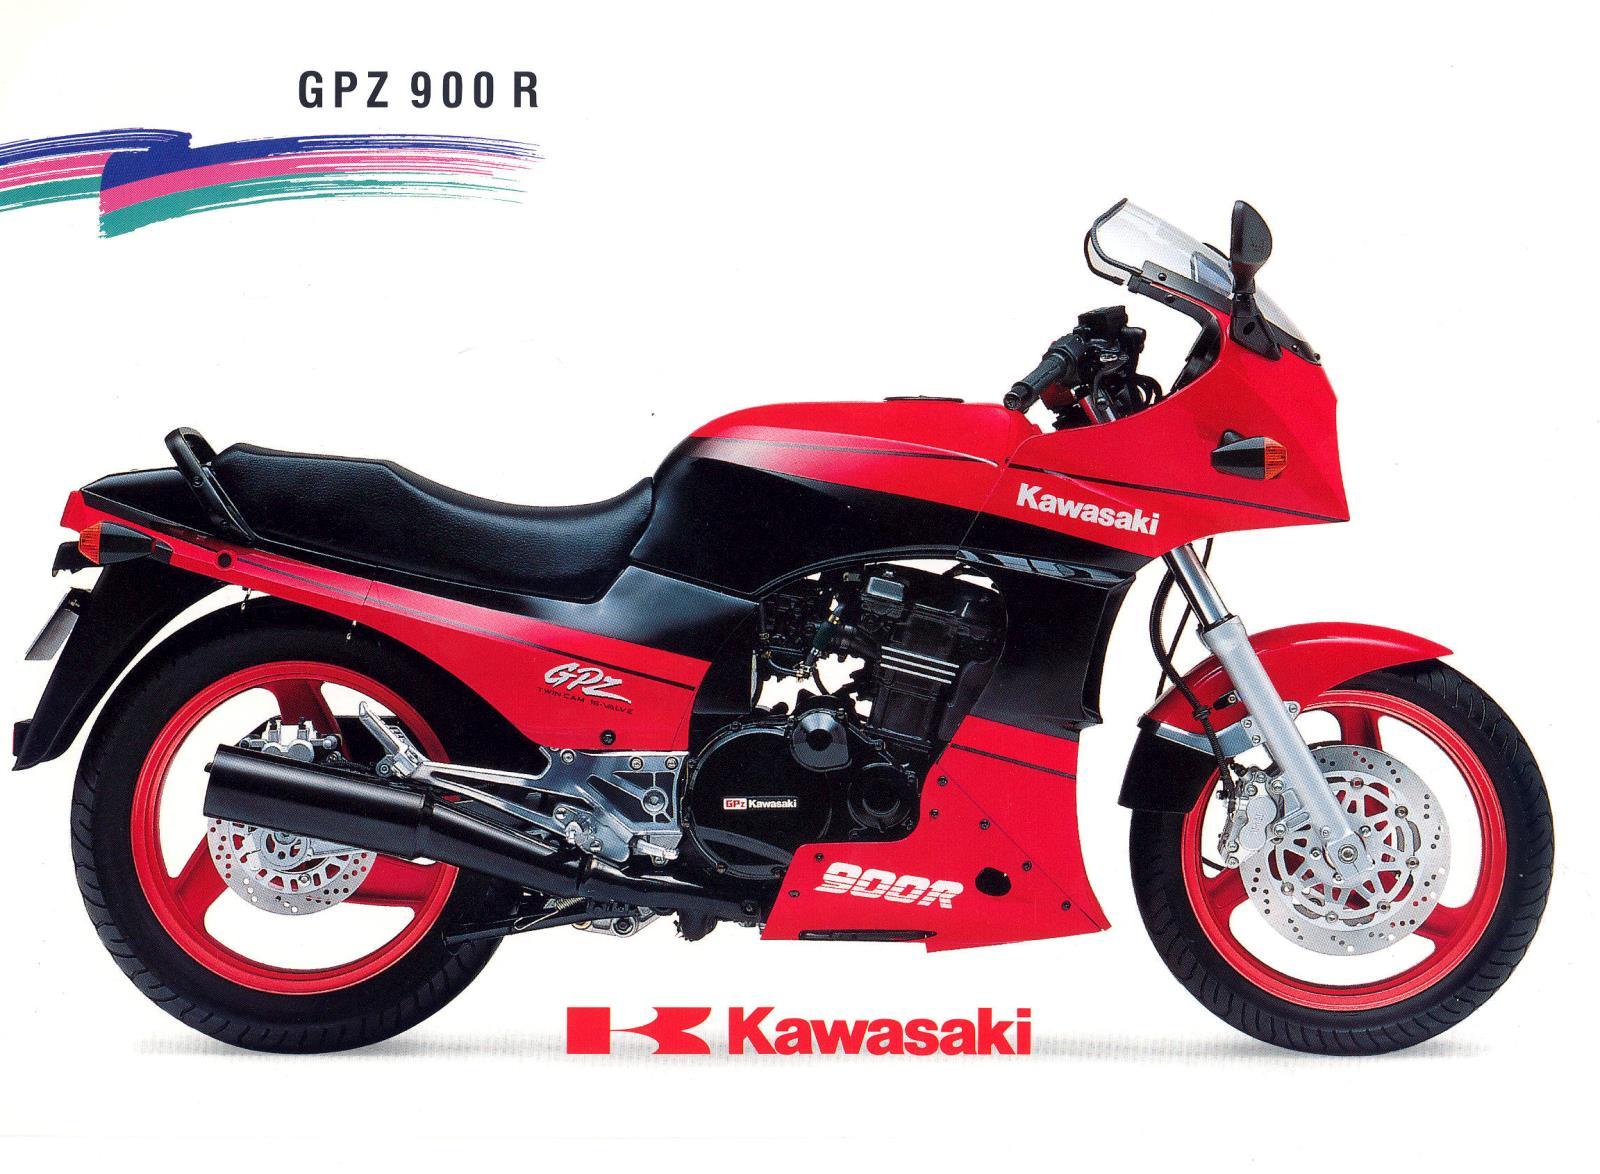 Kawasaki Gpz Review